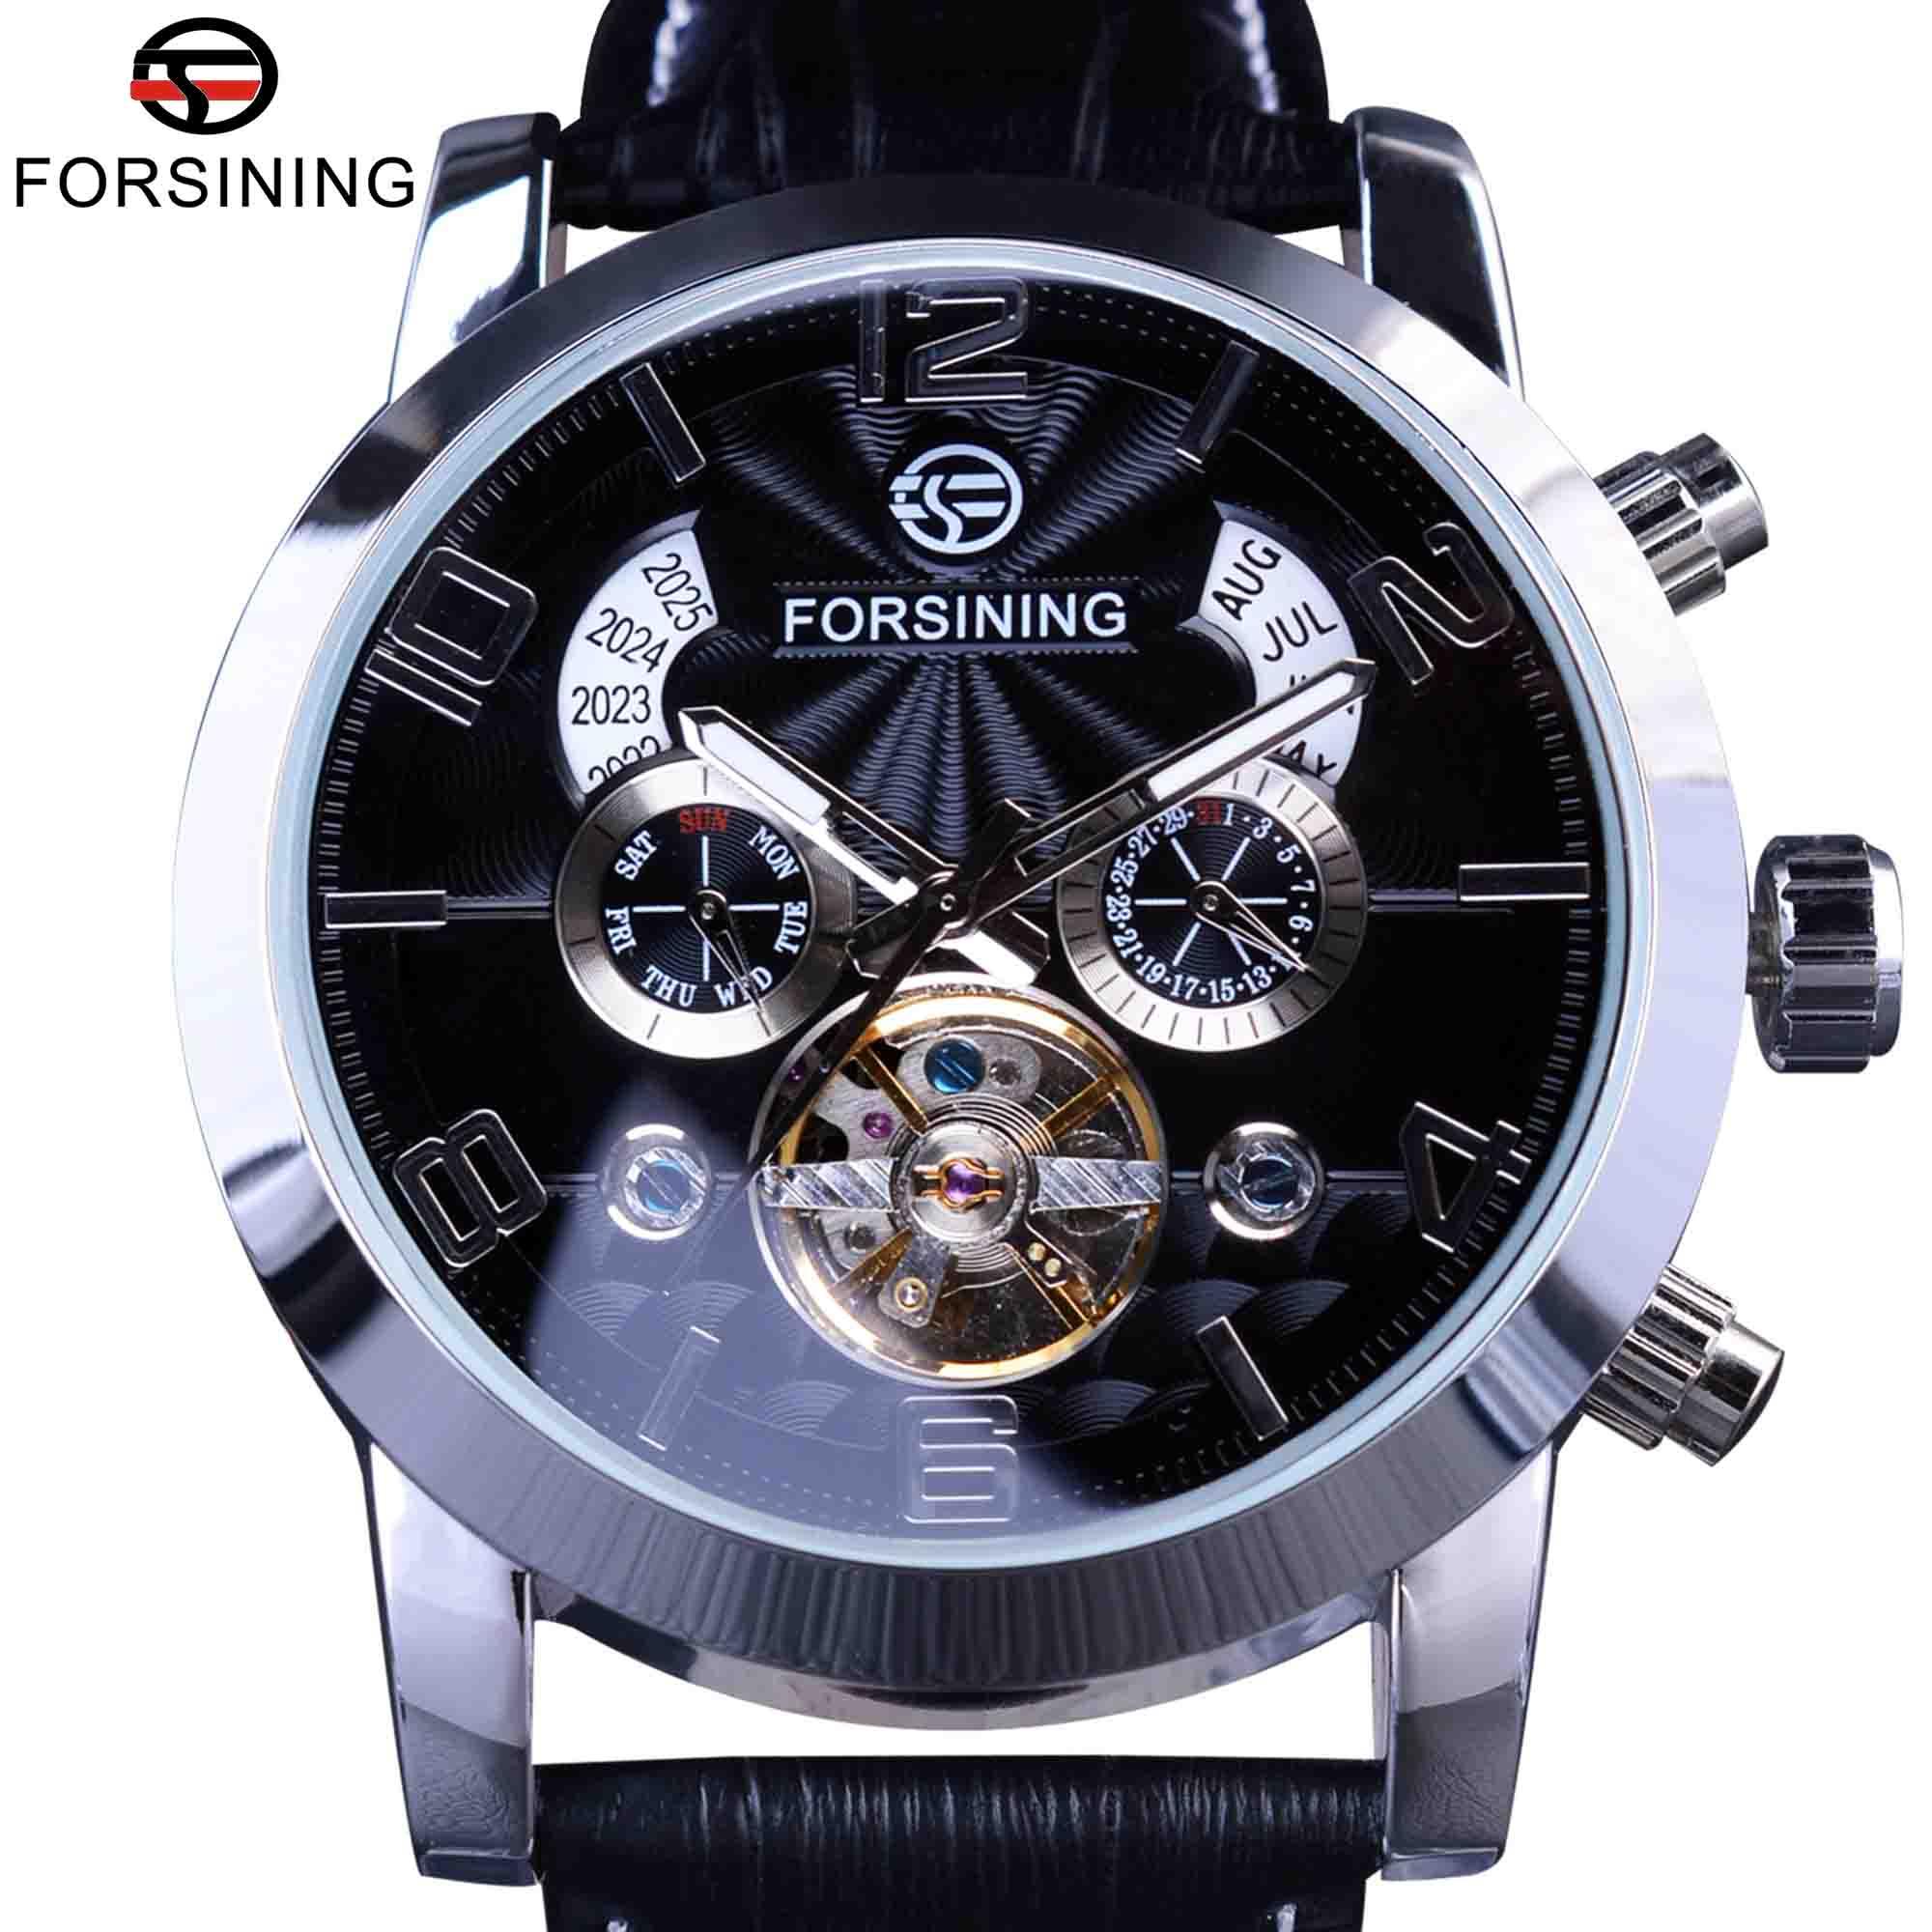 Forsining Tourbillion Fashion Wave Dial Design Multi Function Display Men Automatic Watch Top Brand Luxury Mechanical Wristwatch<br>